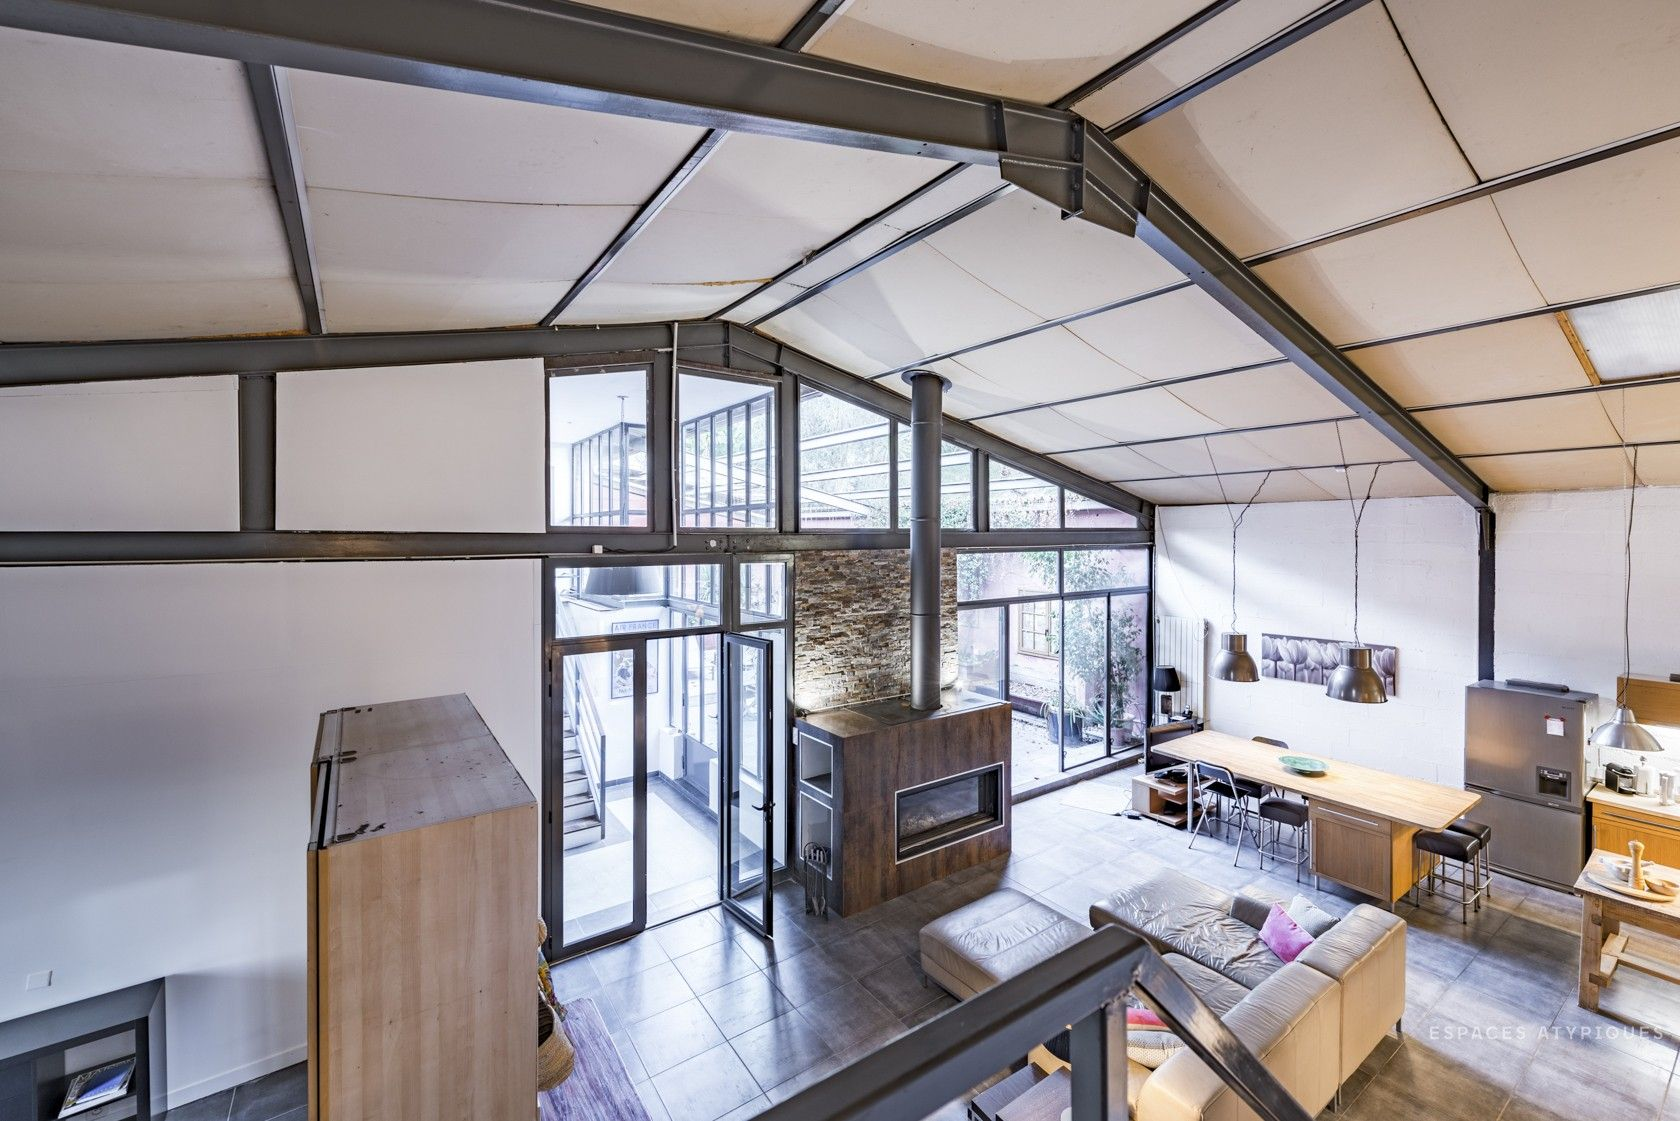 Agence Design Industriel Marseille loft industriel avec patio - marseille | loft industriel